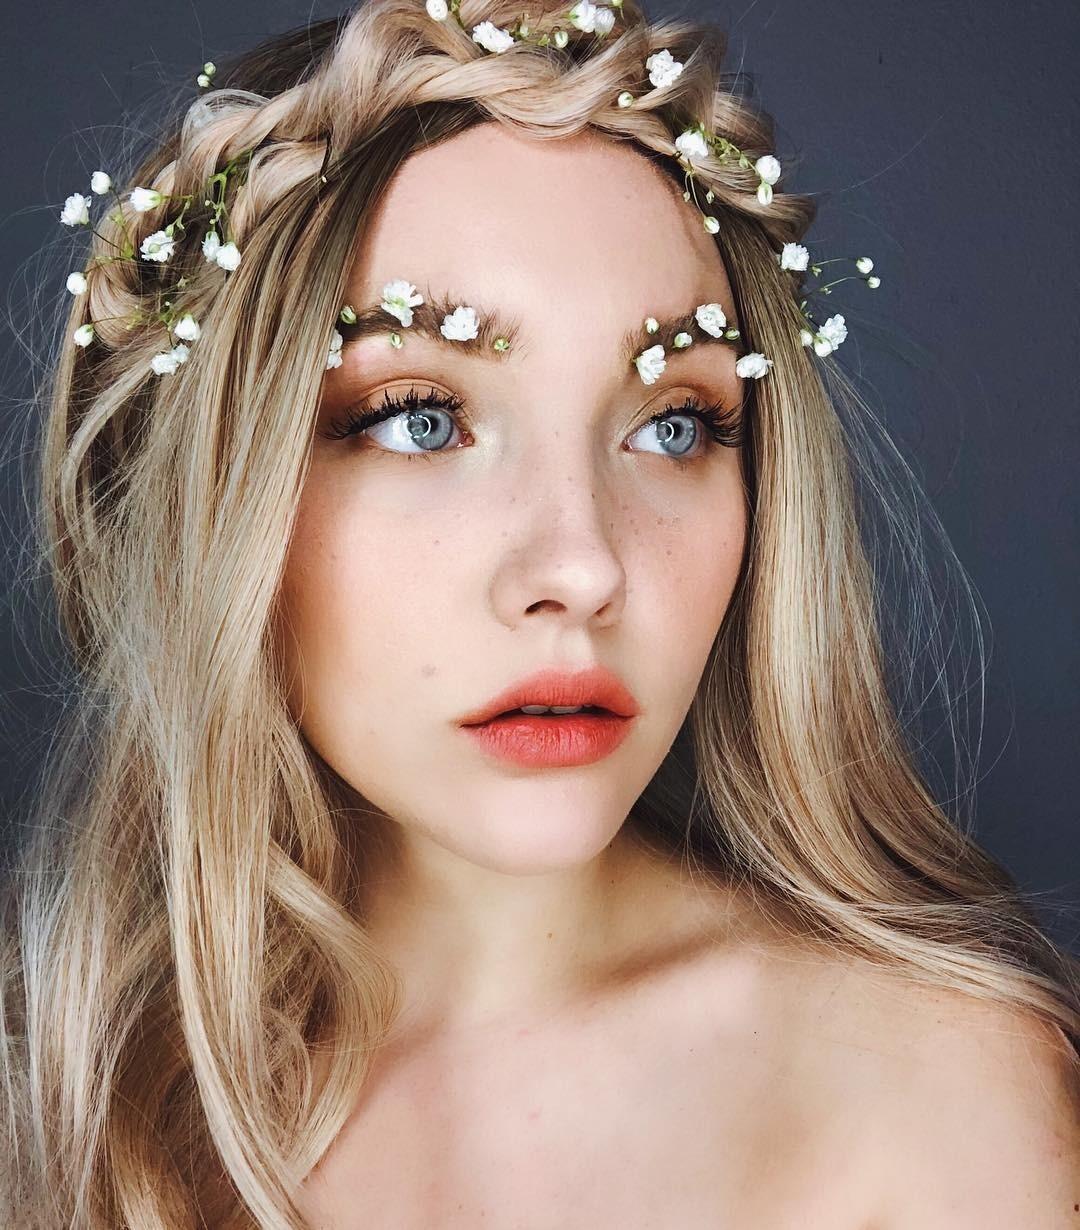 @makeup_by_darin